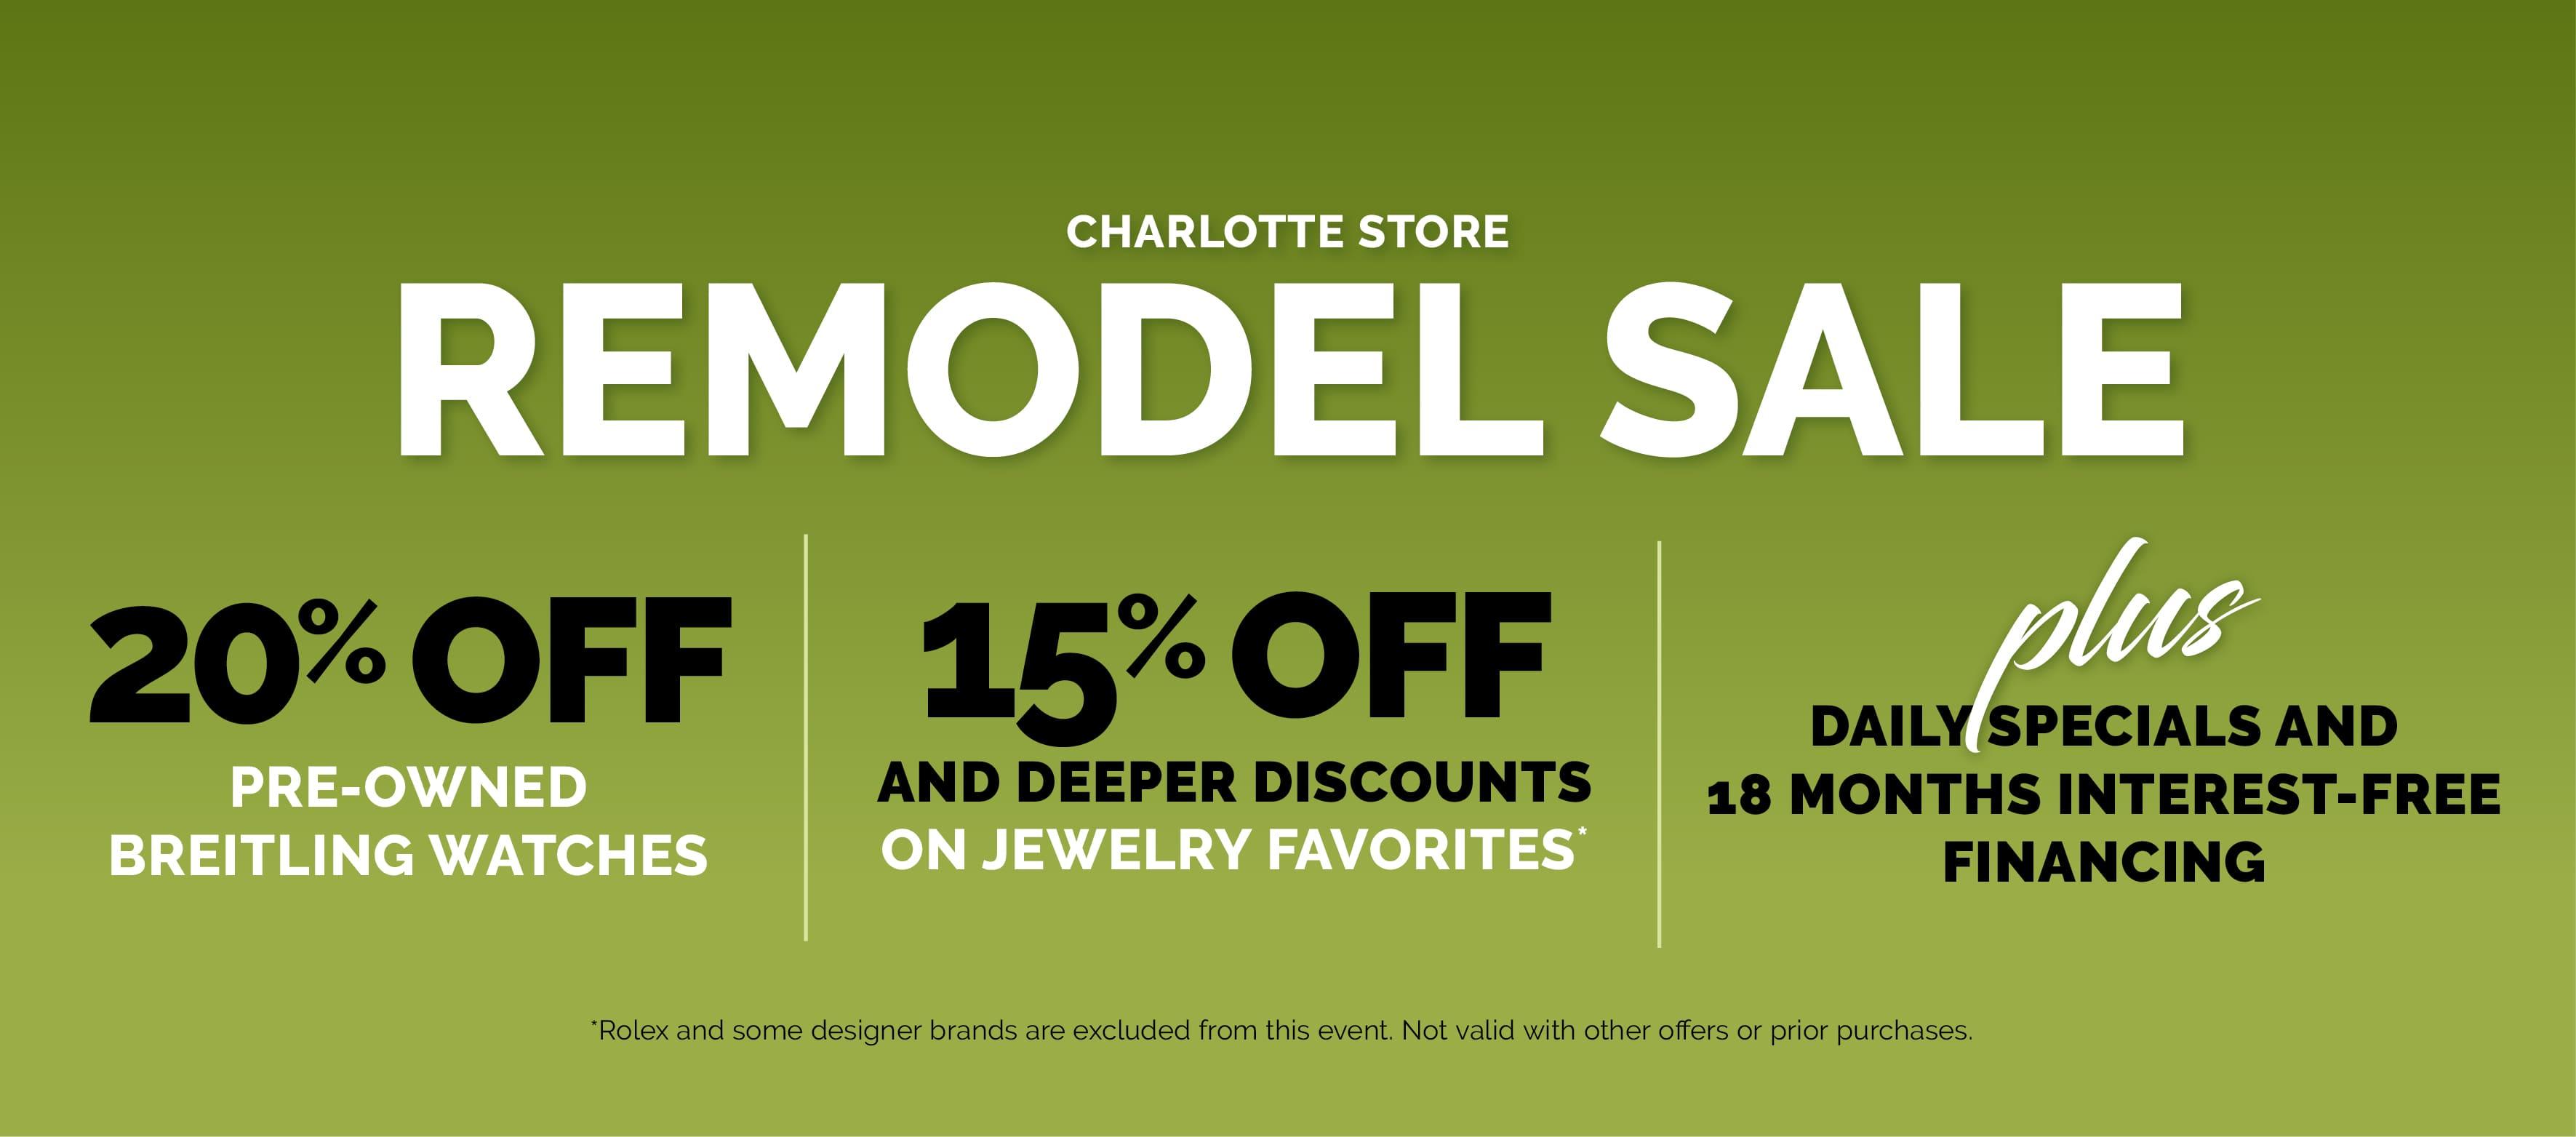 Charlotte Store Remodel Sale